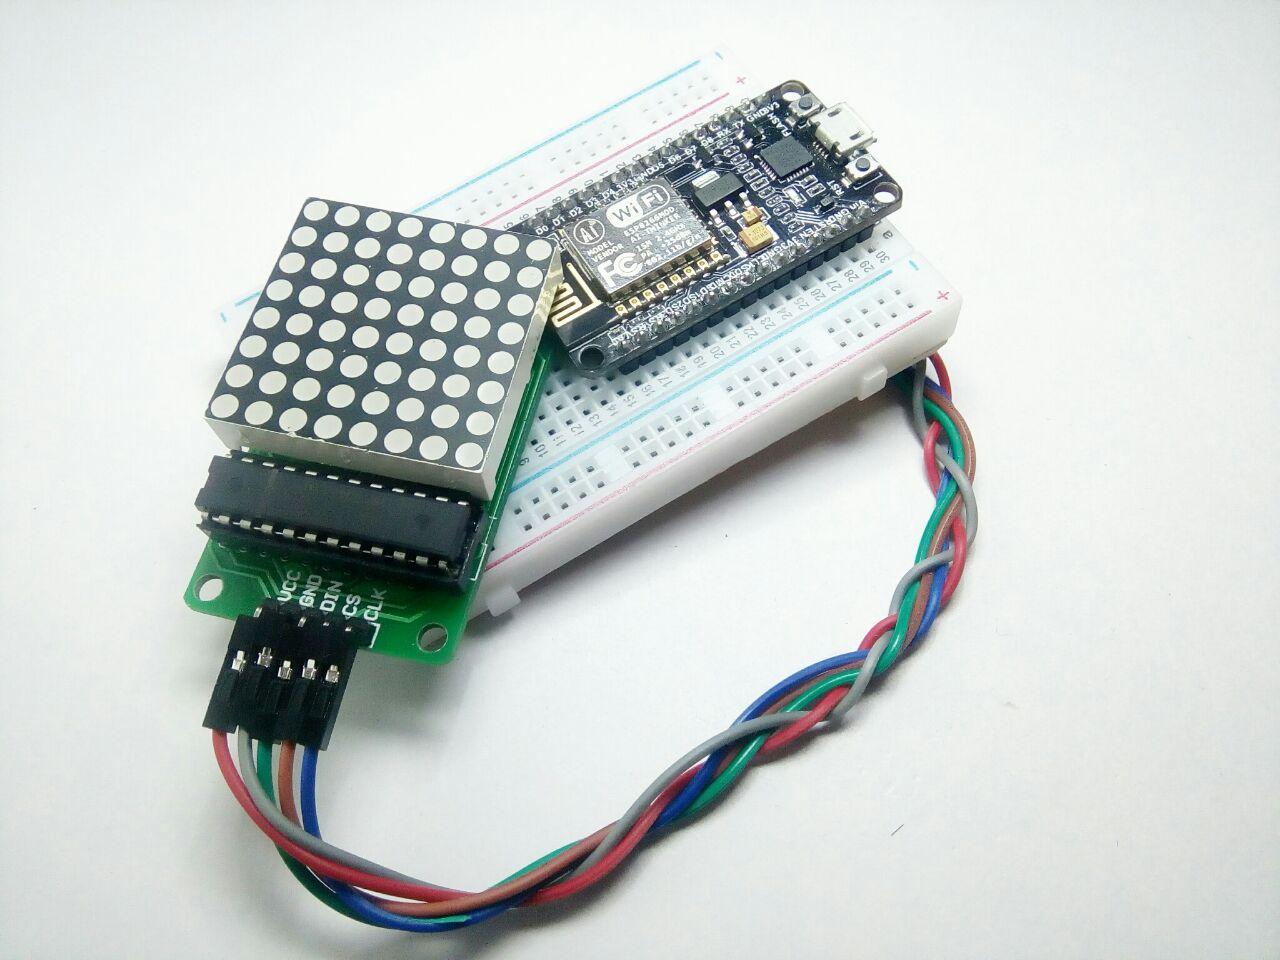 Picture of Interface LED Dot Matrix (8x8) With NodeMCU